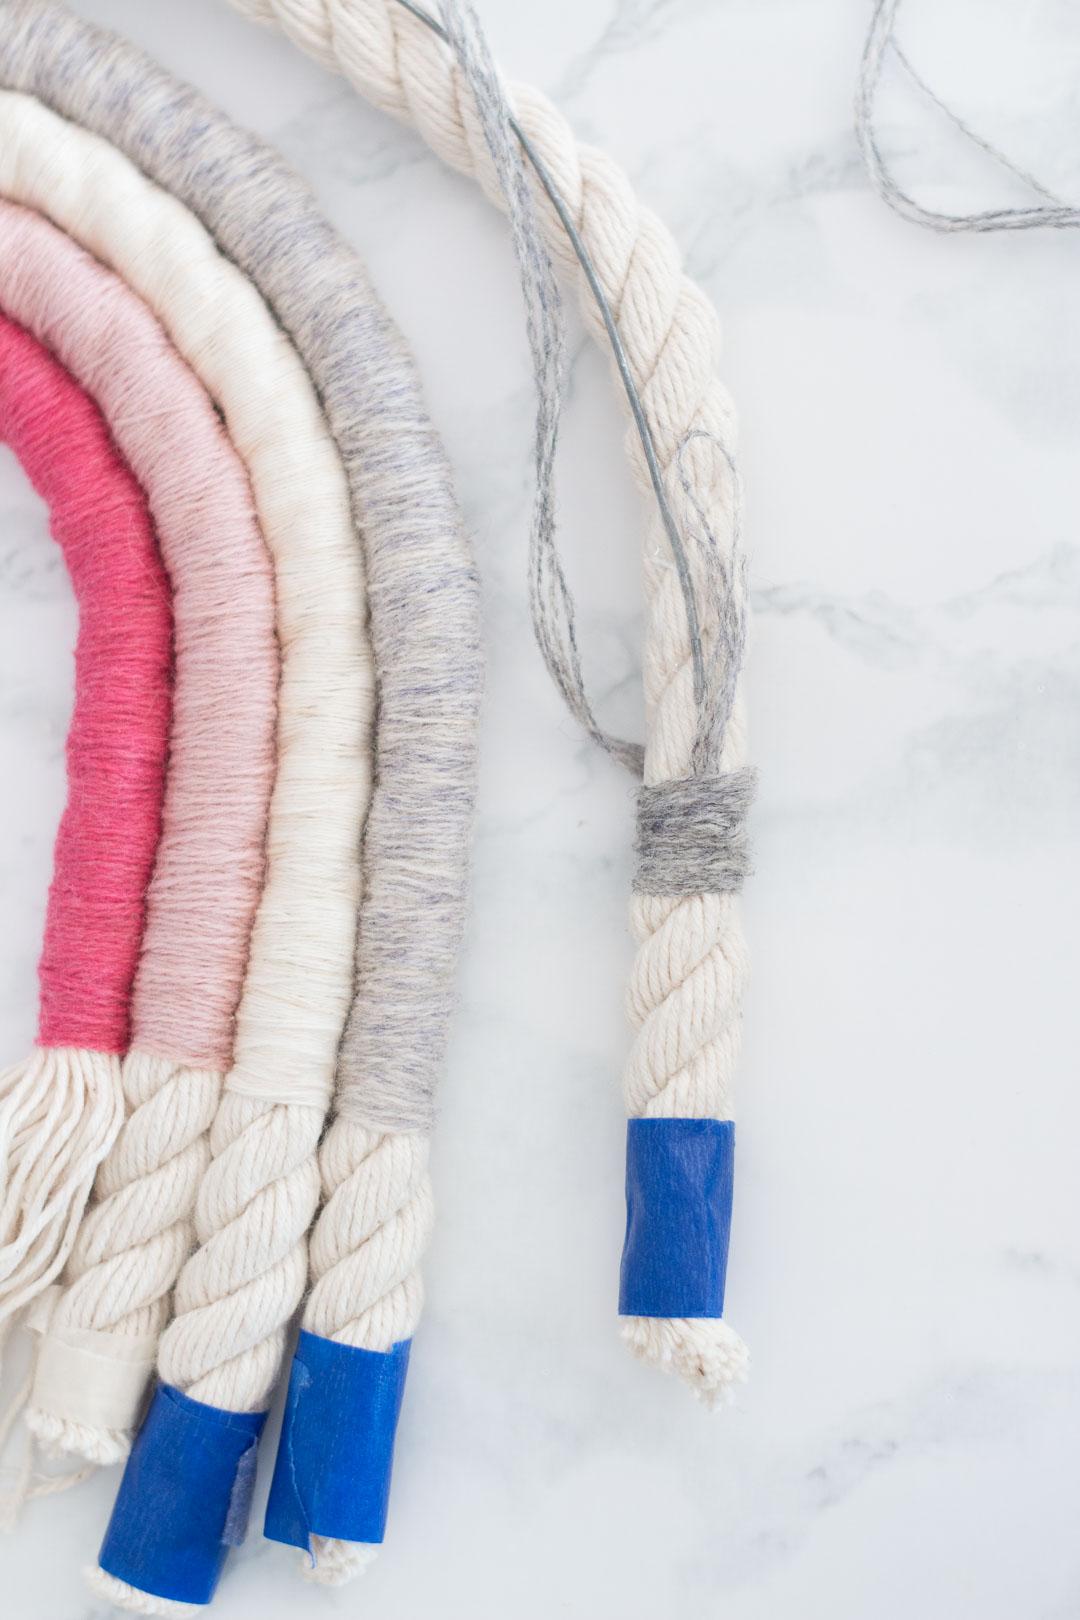 Rope Rainbow Wall Decor Fibre Art Diy Pure Sweet Joy